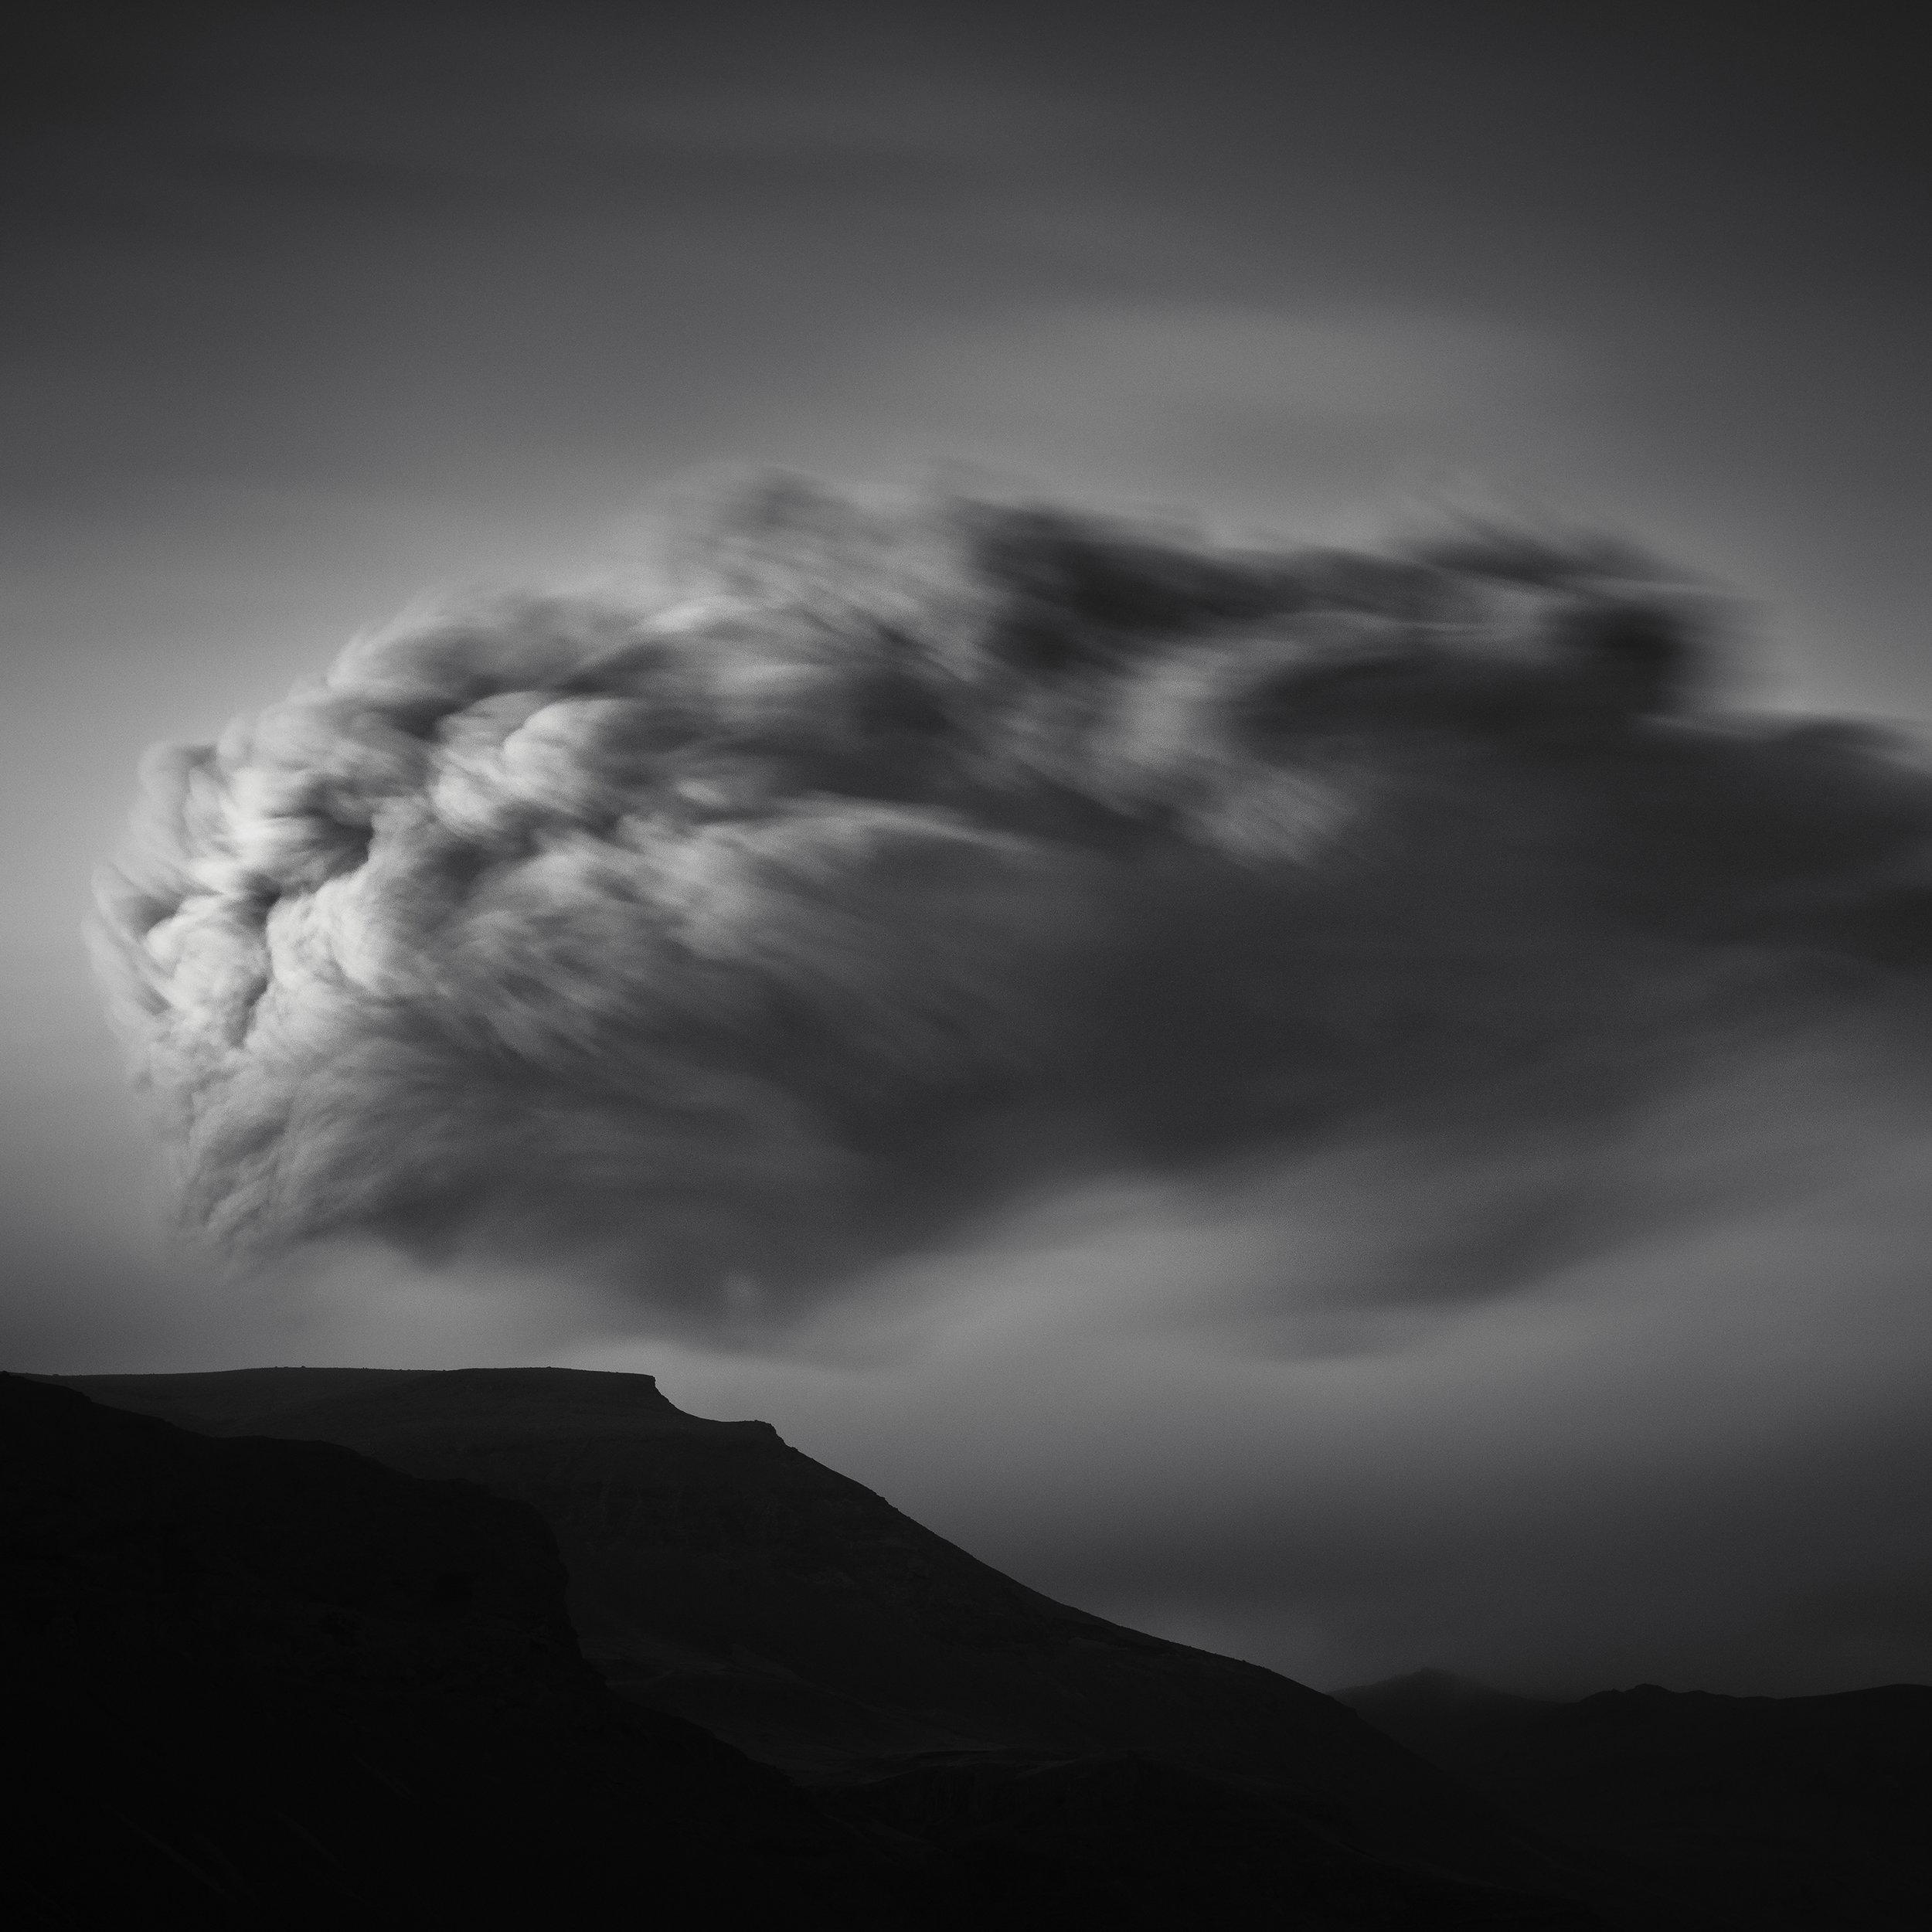 © Eirik Holmøyvik, Last light on the Eyafjallajökull ash plume, South Iceland 2010